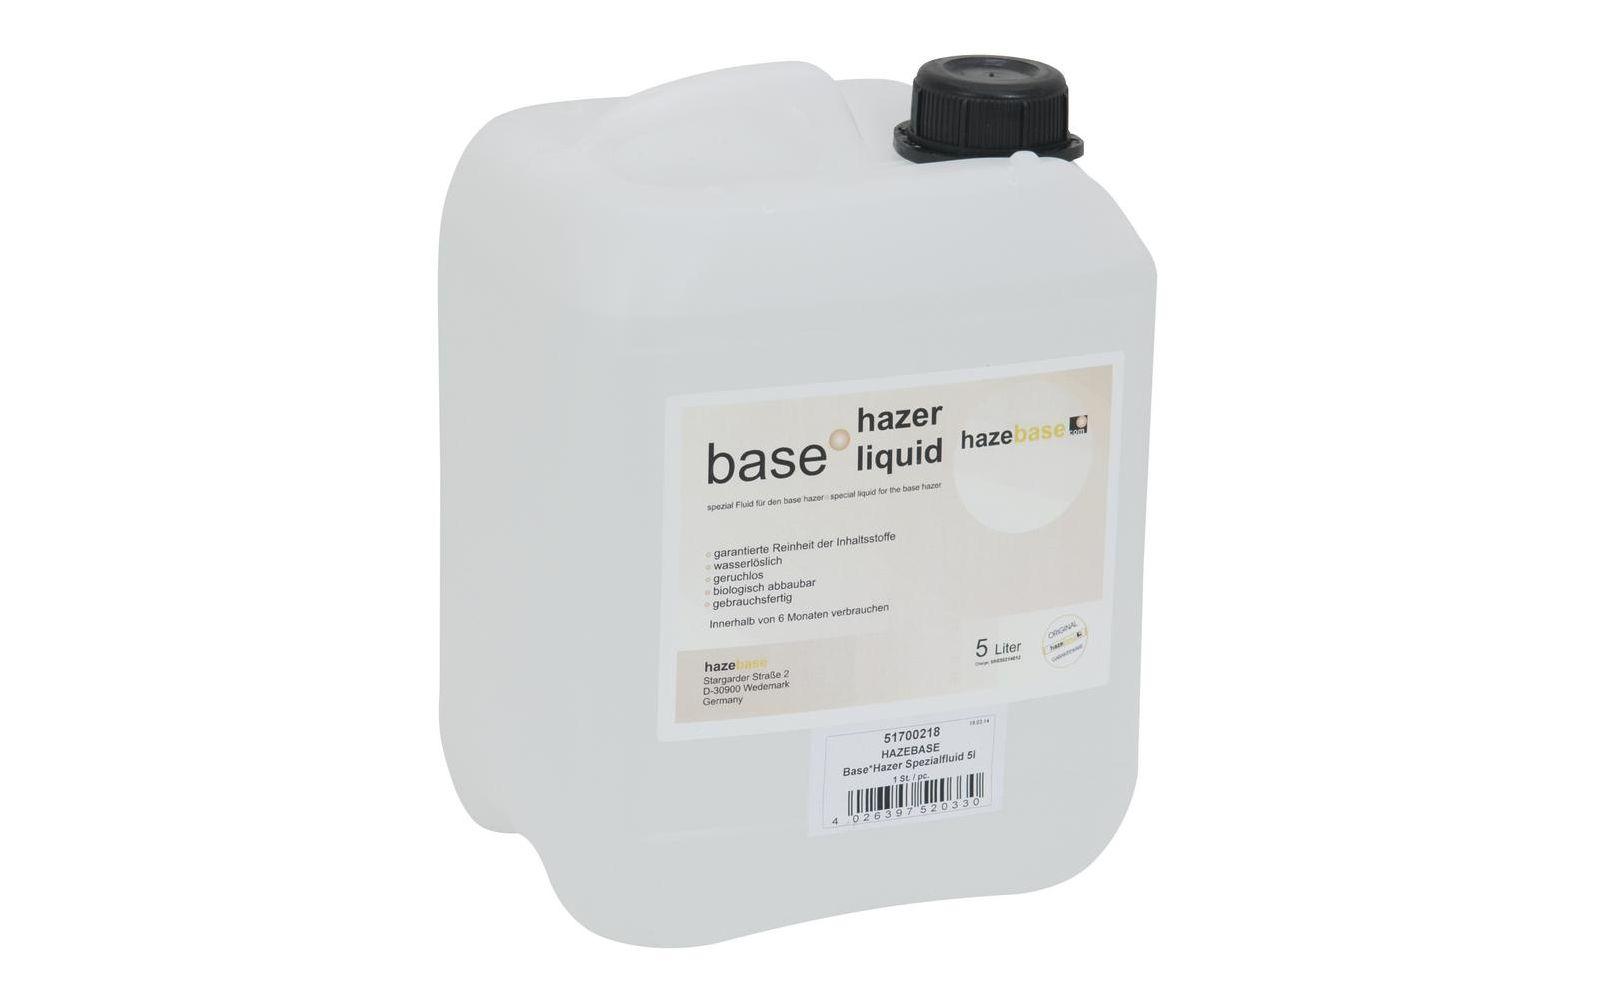 hazebase-base-hazer-spezialfluid-5l-kanister